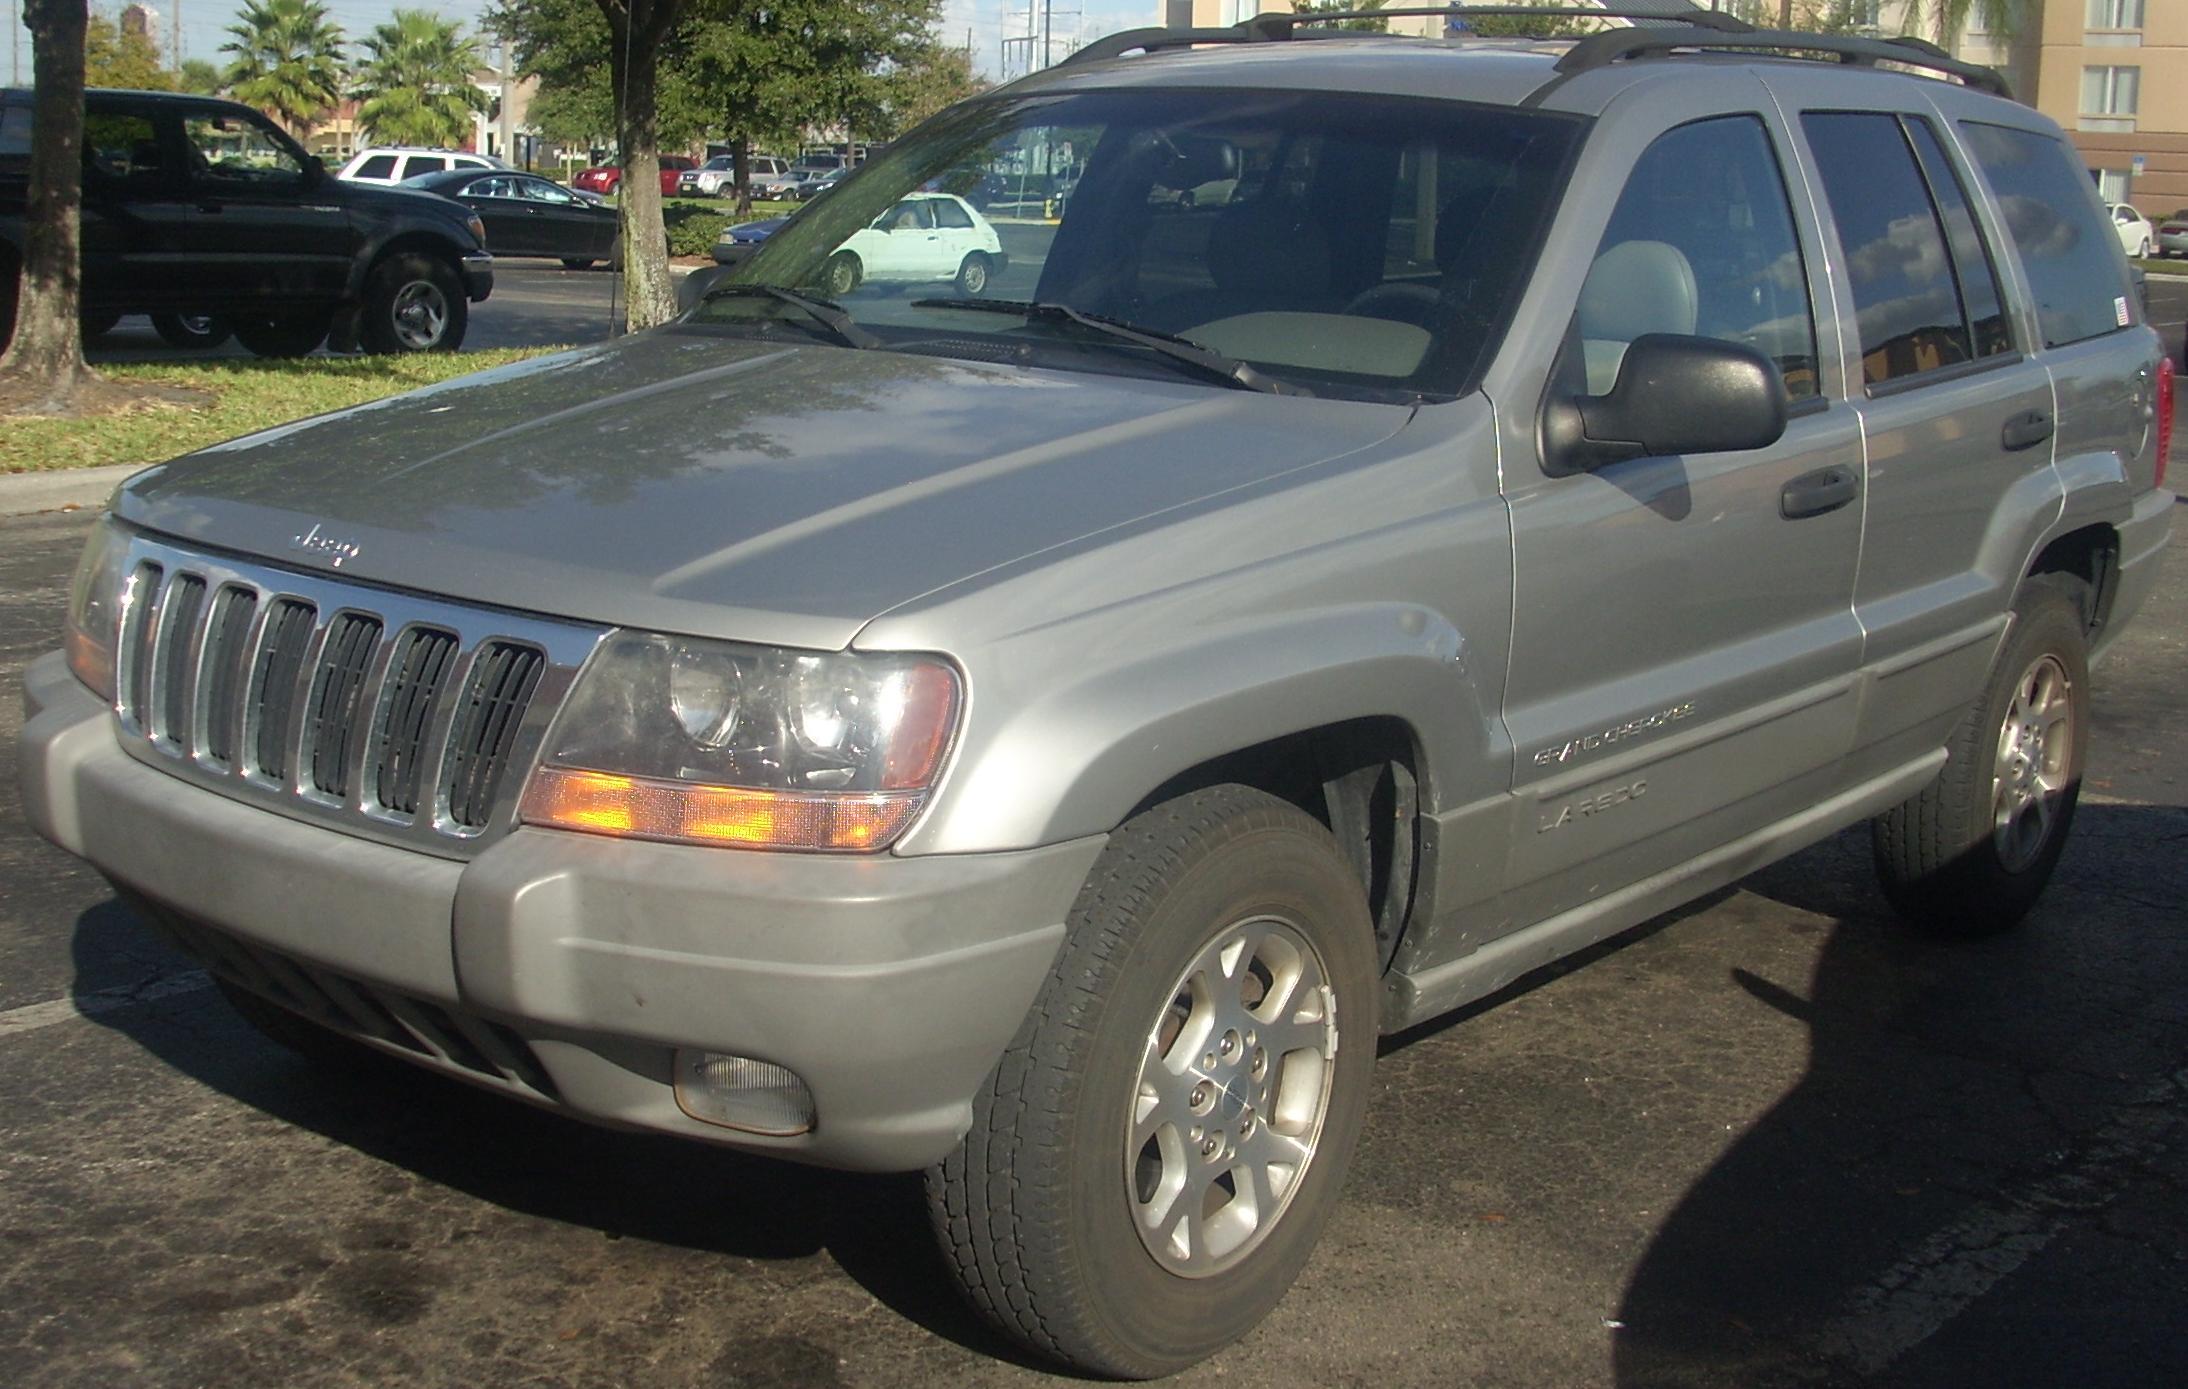 File:1999 2003 Jeep Grand Cherokee Laredo.JPG